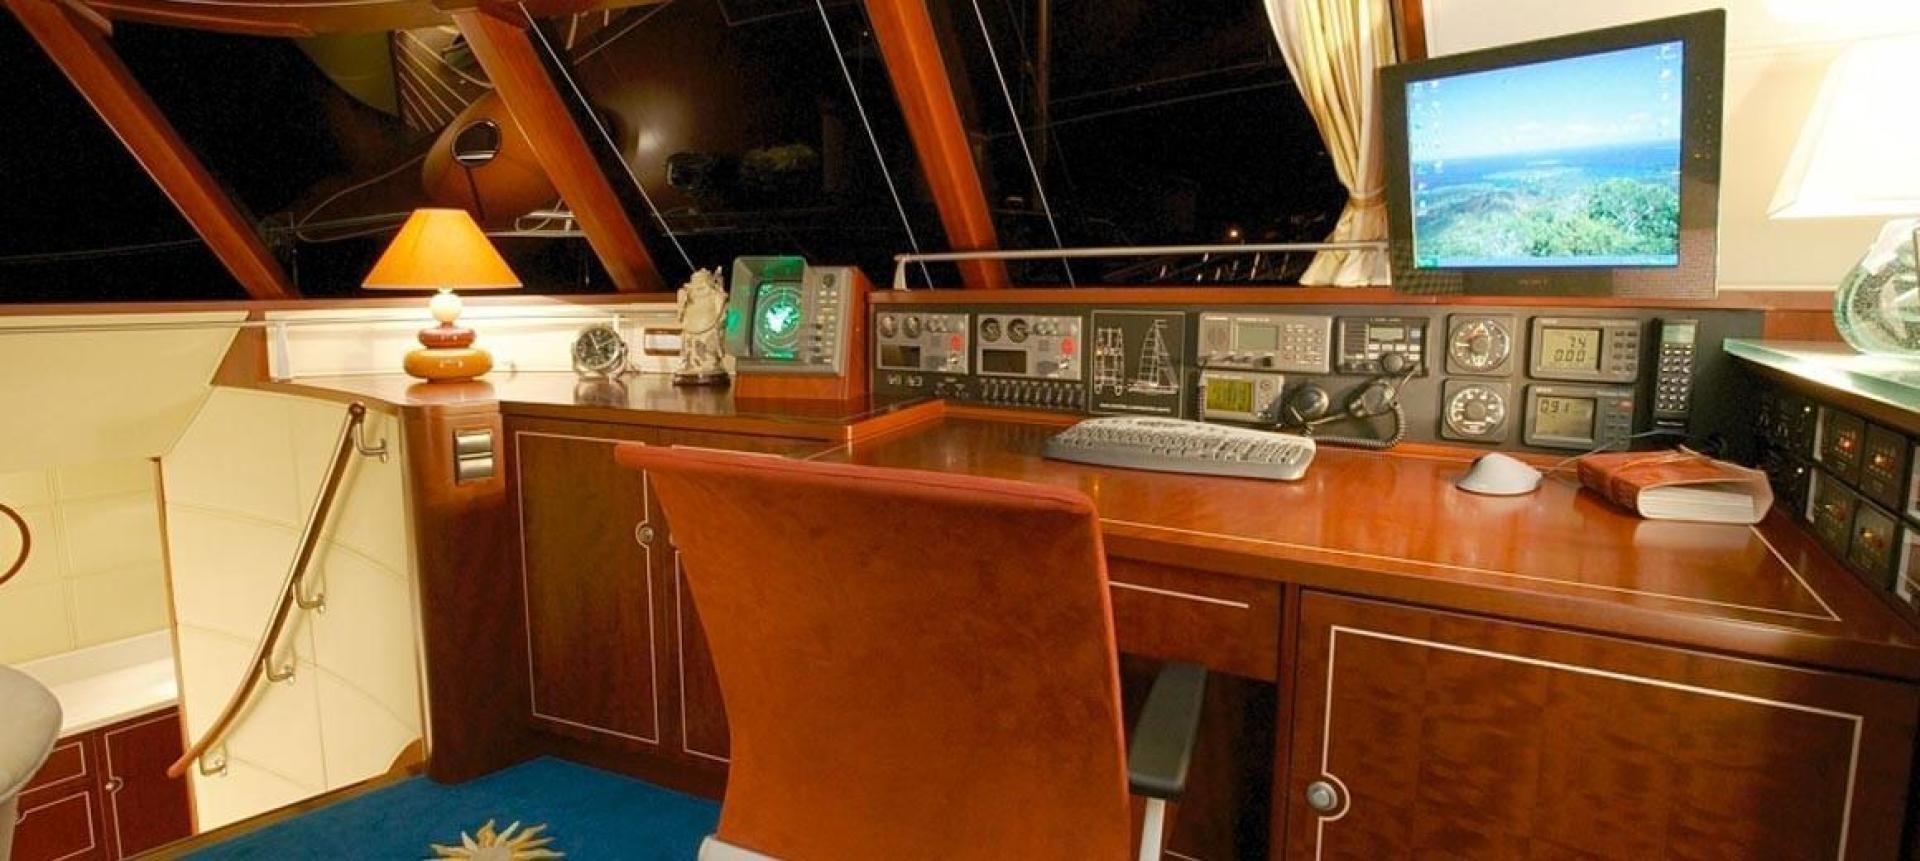 JFA-Catamaran 2004 -Miami-Florida-United States-1367457 | Thumbnail